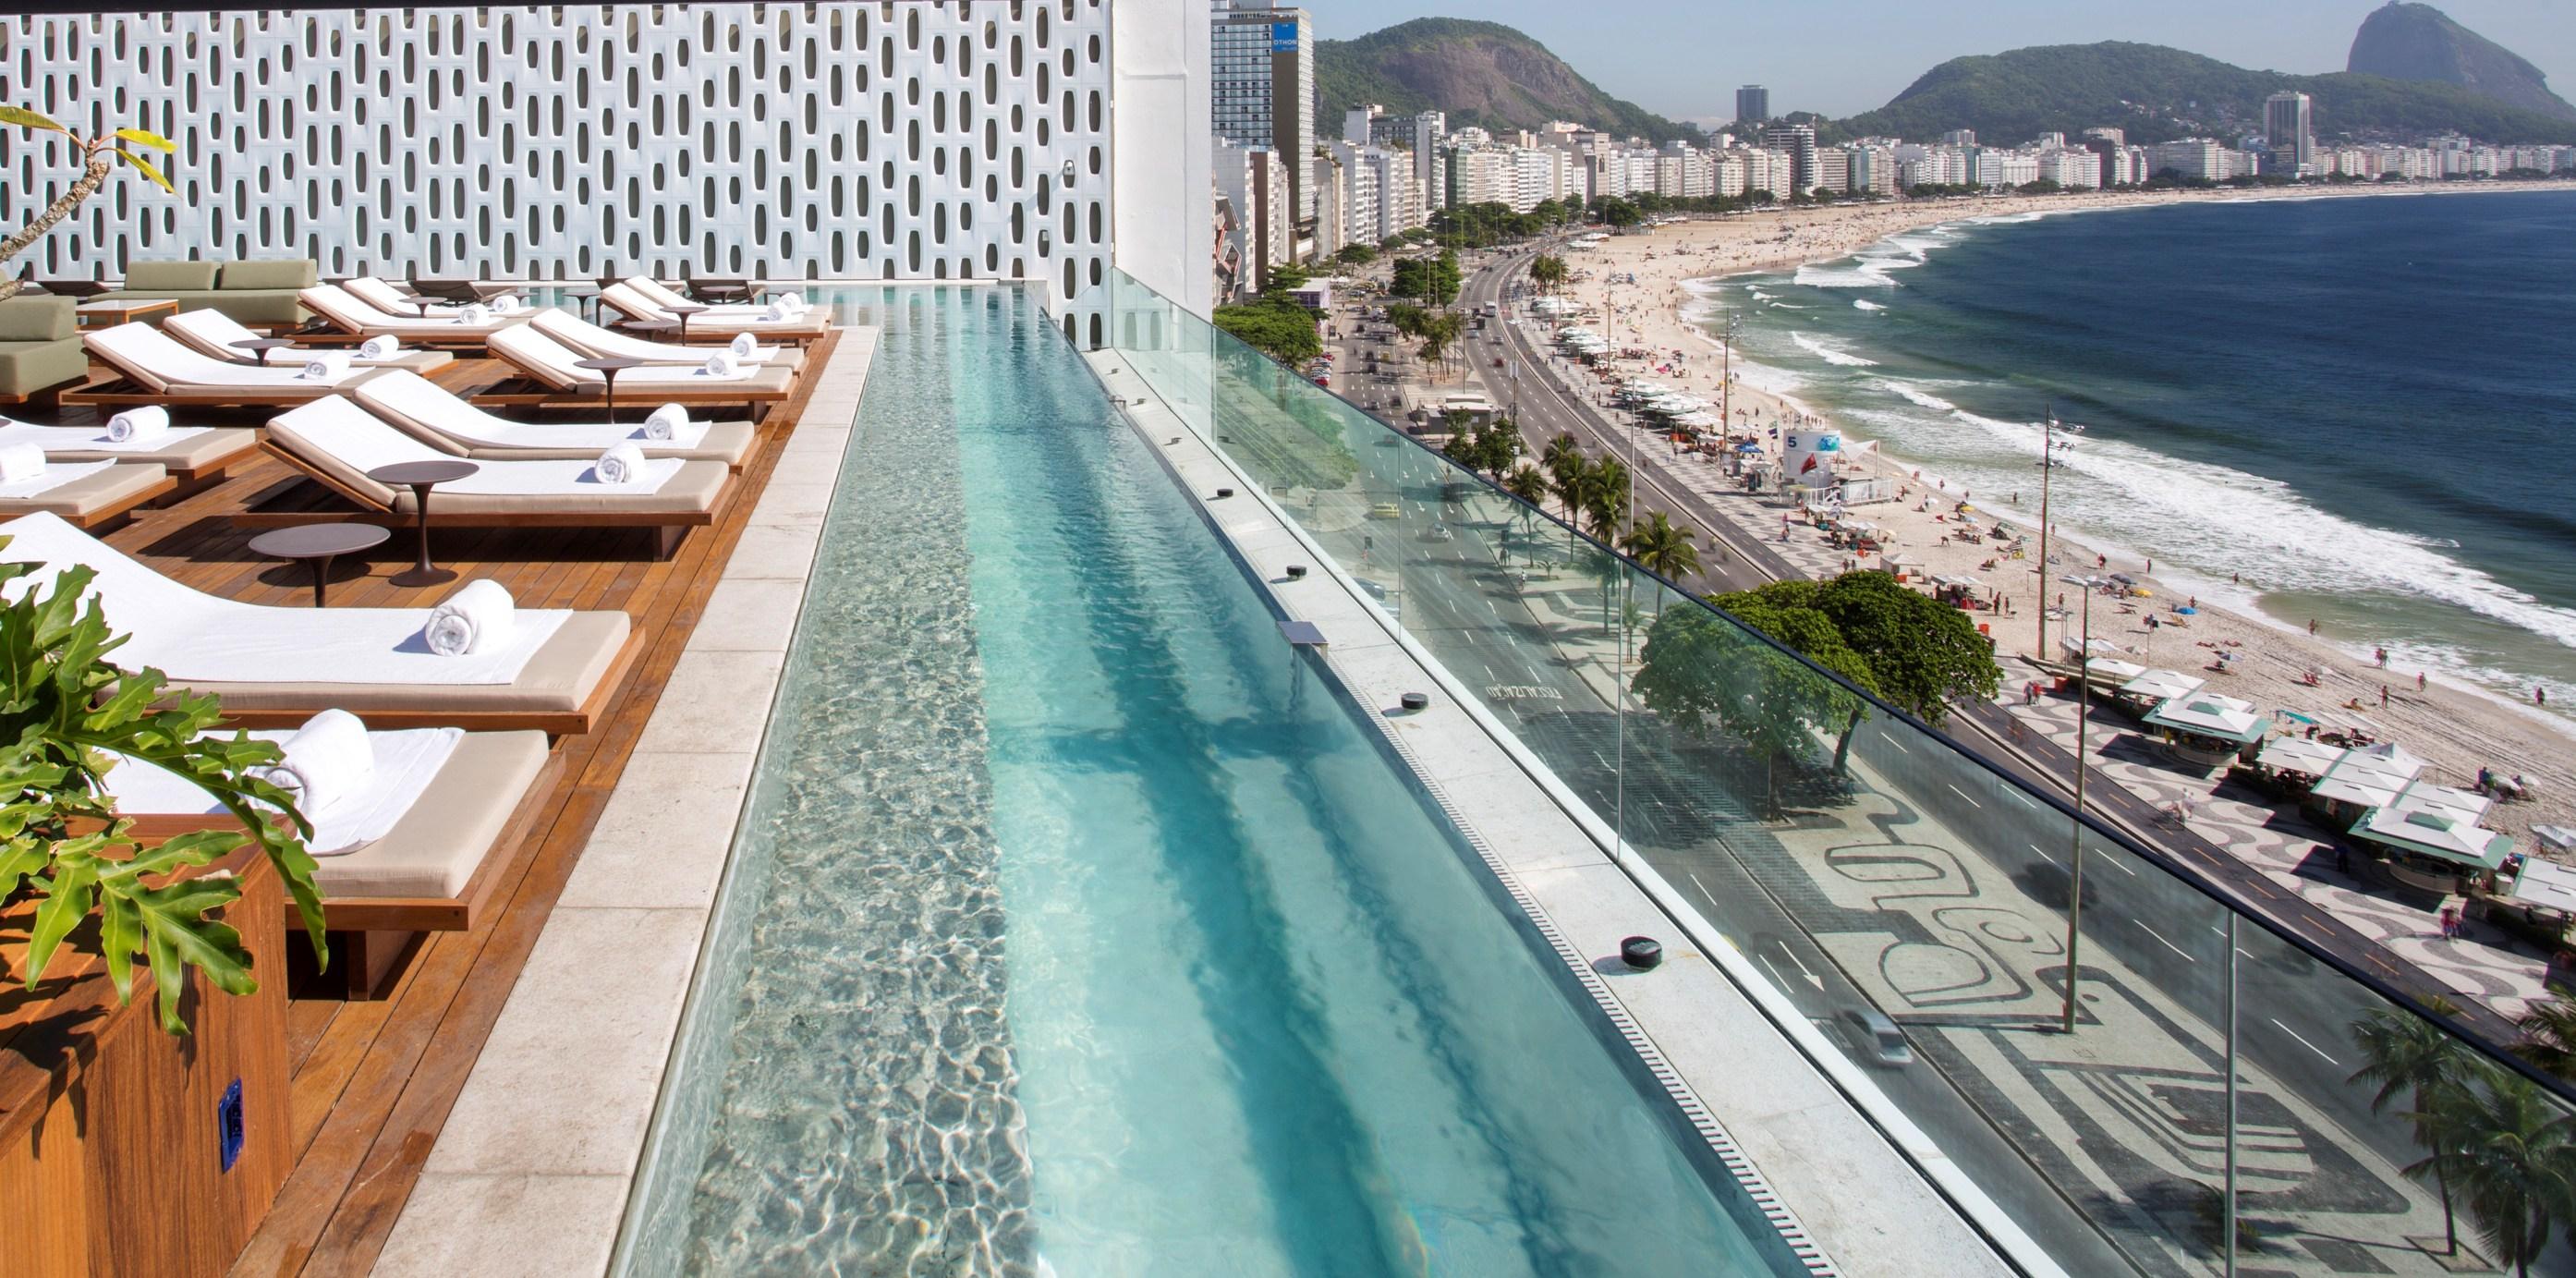 hotéis réveillon brasil hotel emiliano rio de janeiro